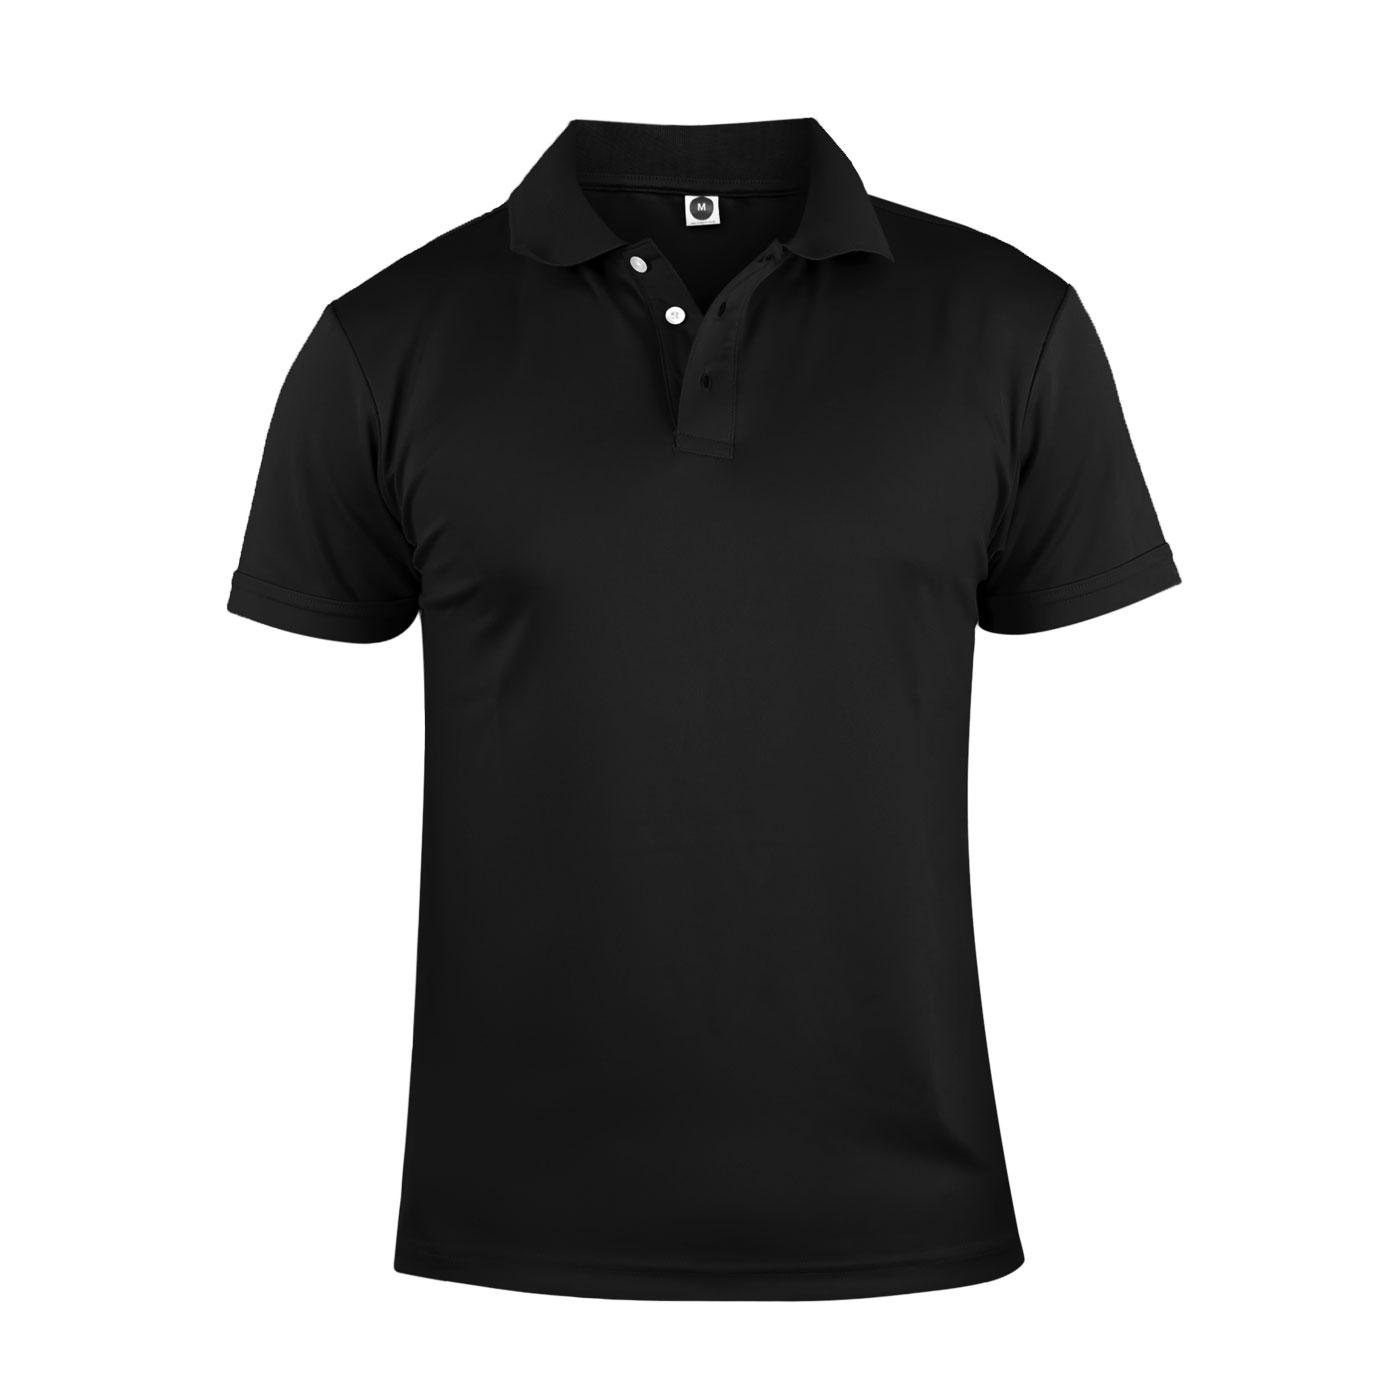 HODARLA 彈力涼感短袖POLO衫 3113901 - 黑